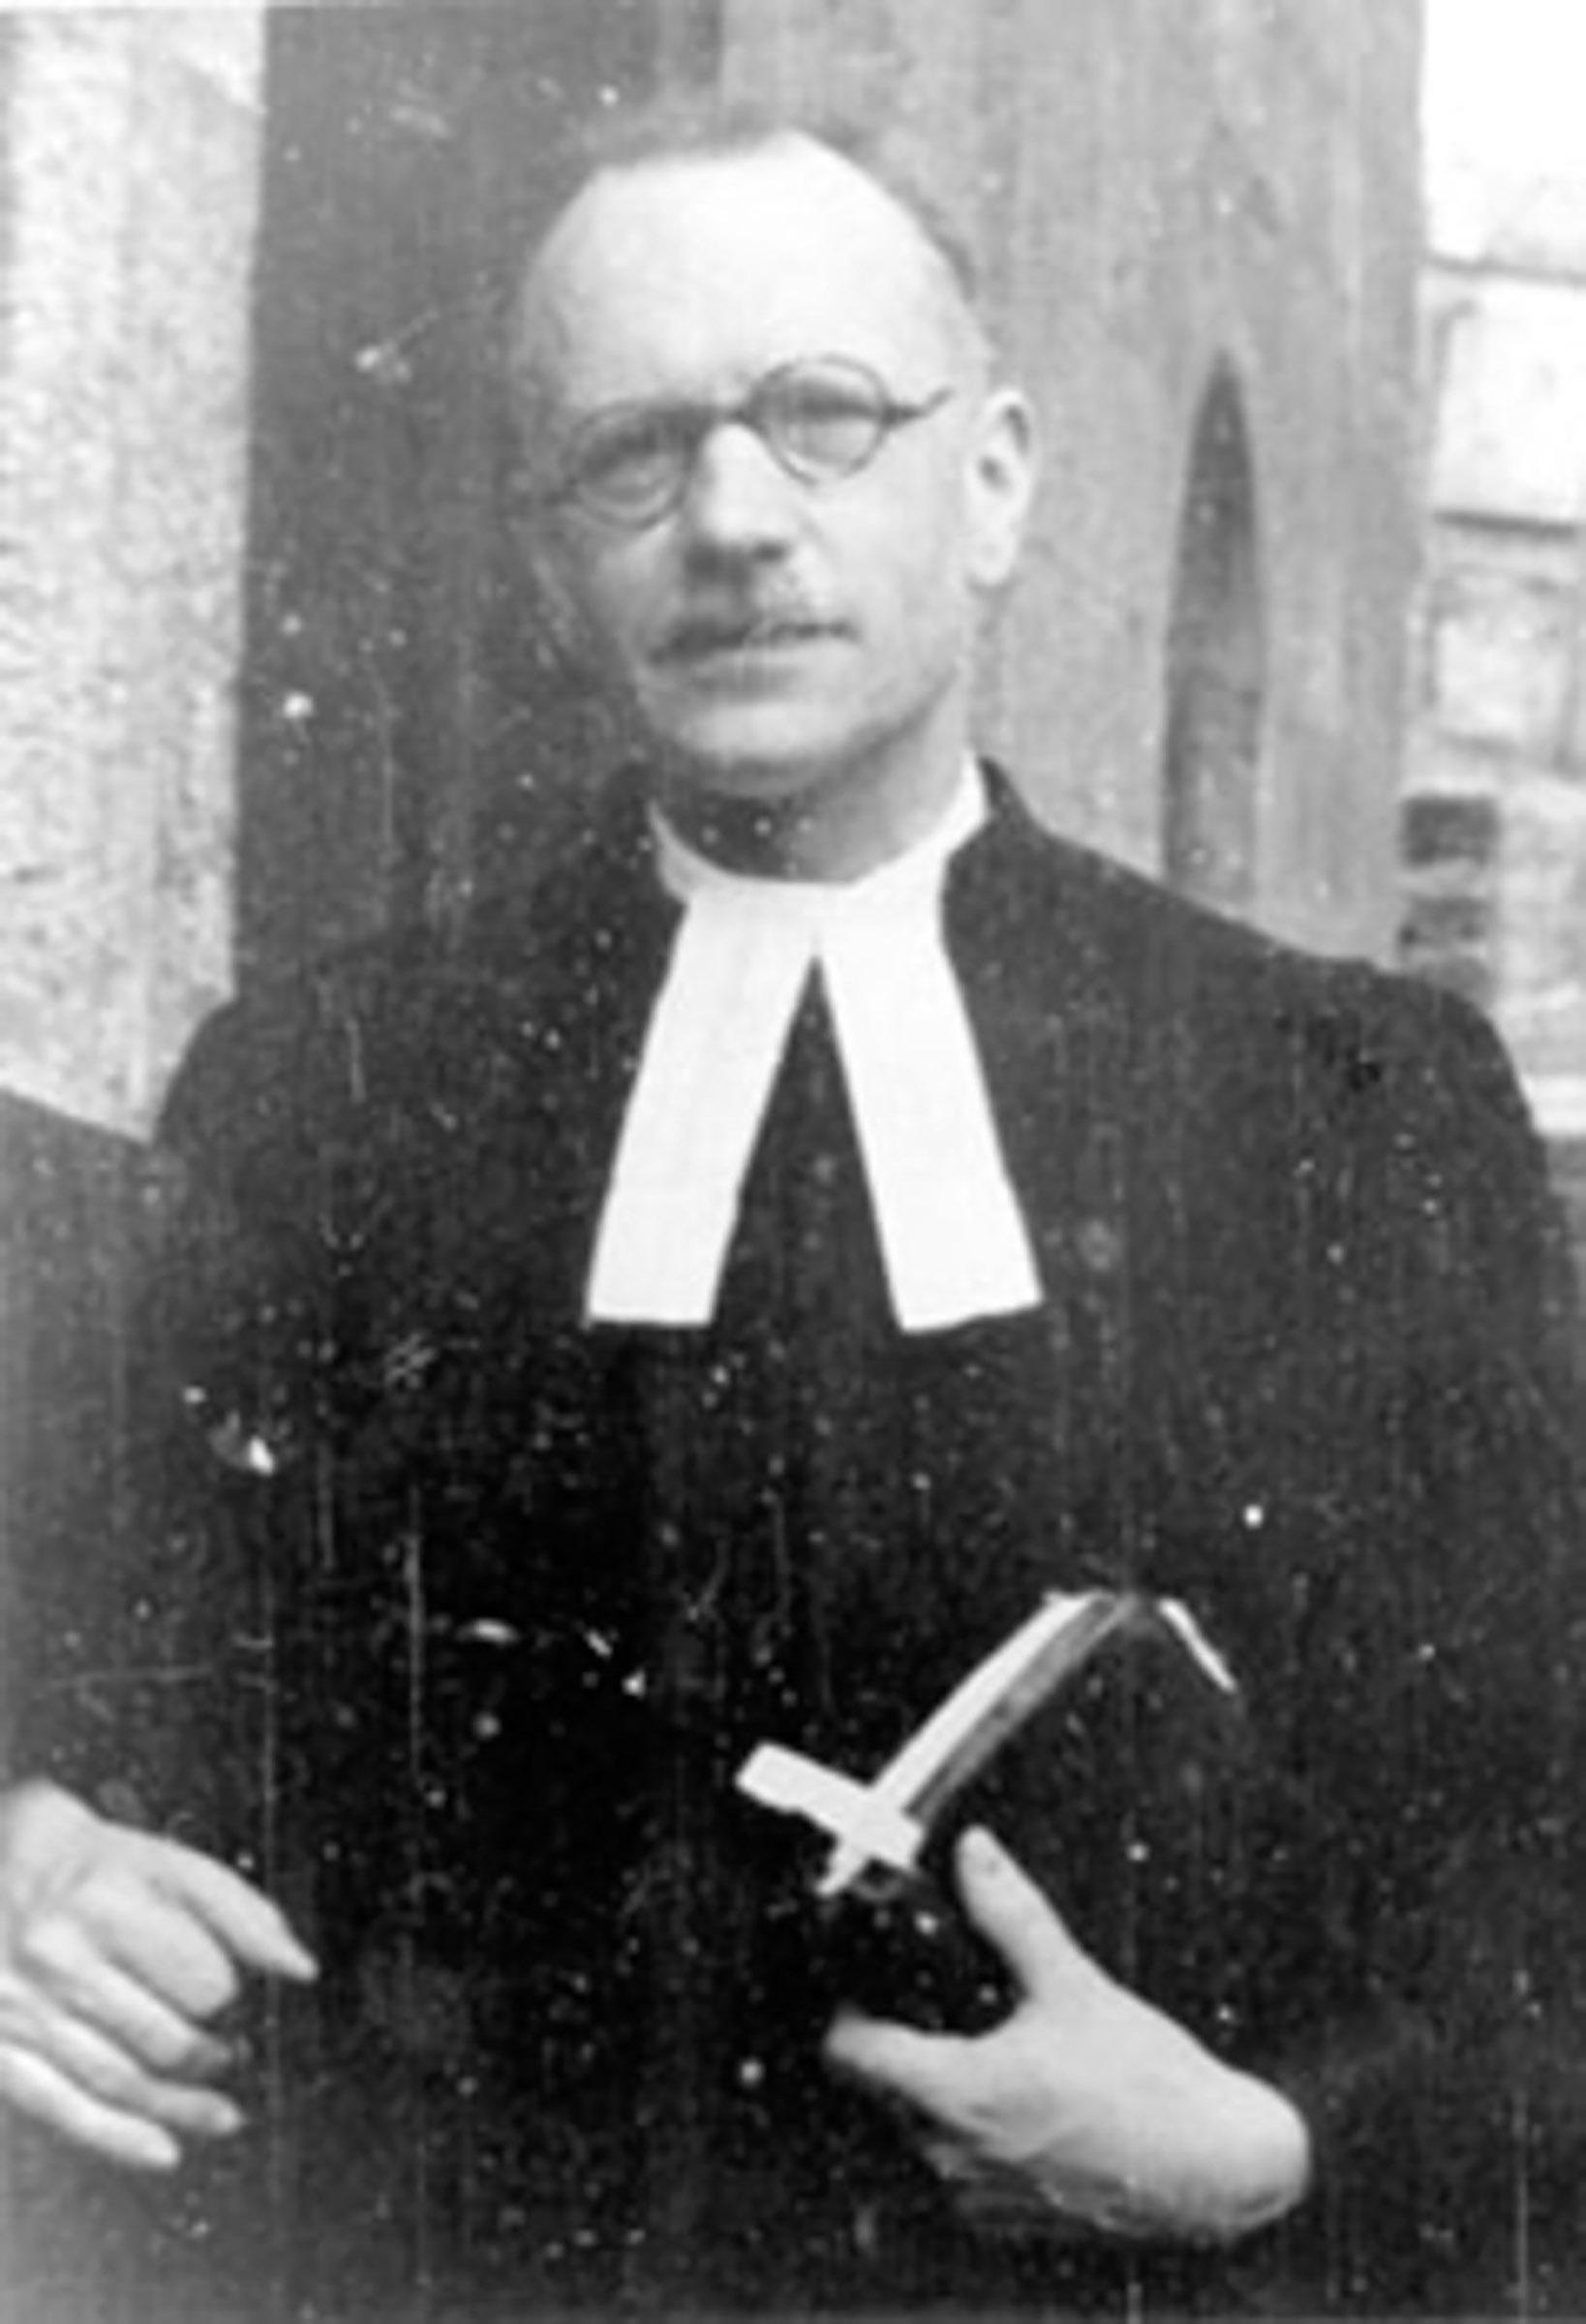 Pastor André Trocmé in Vivarais-Lignon. During World War II, Trocmé set up homes for Jewish children.